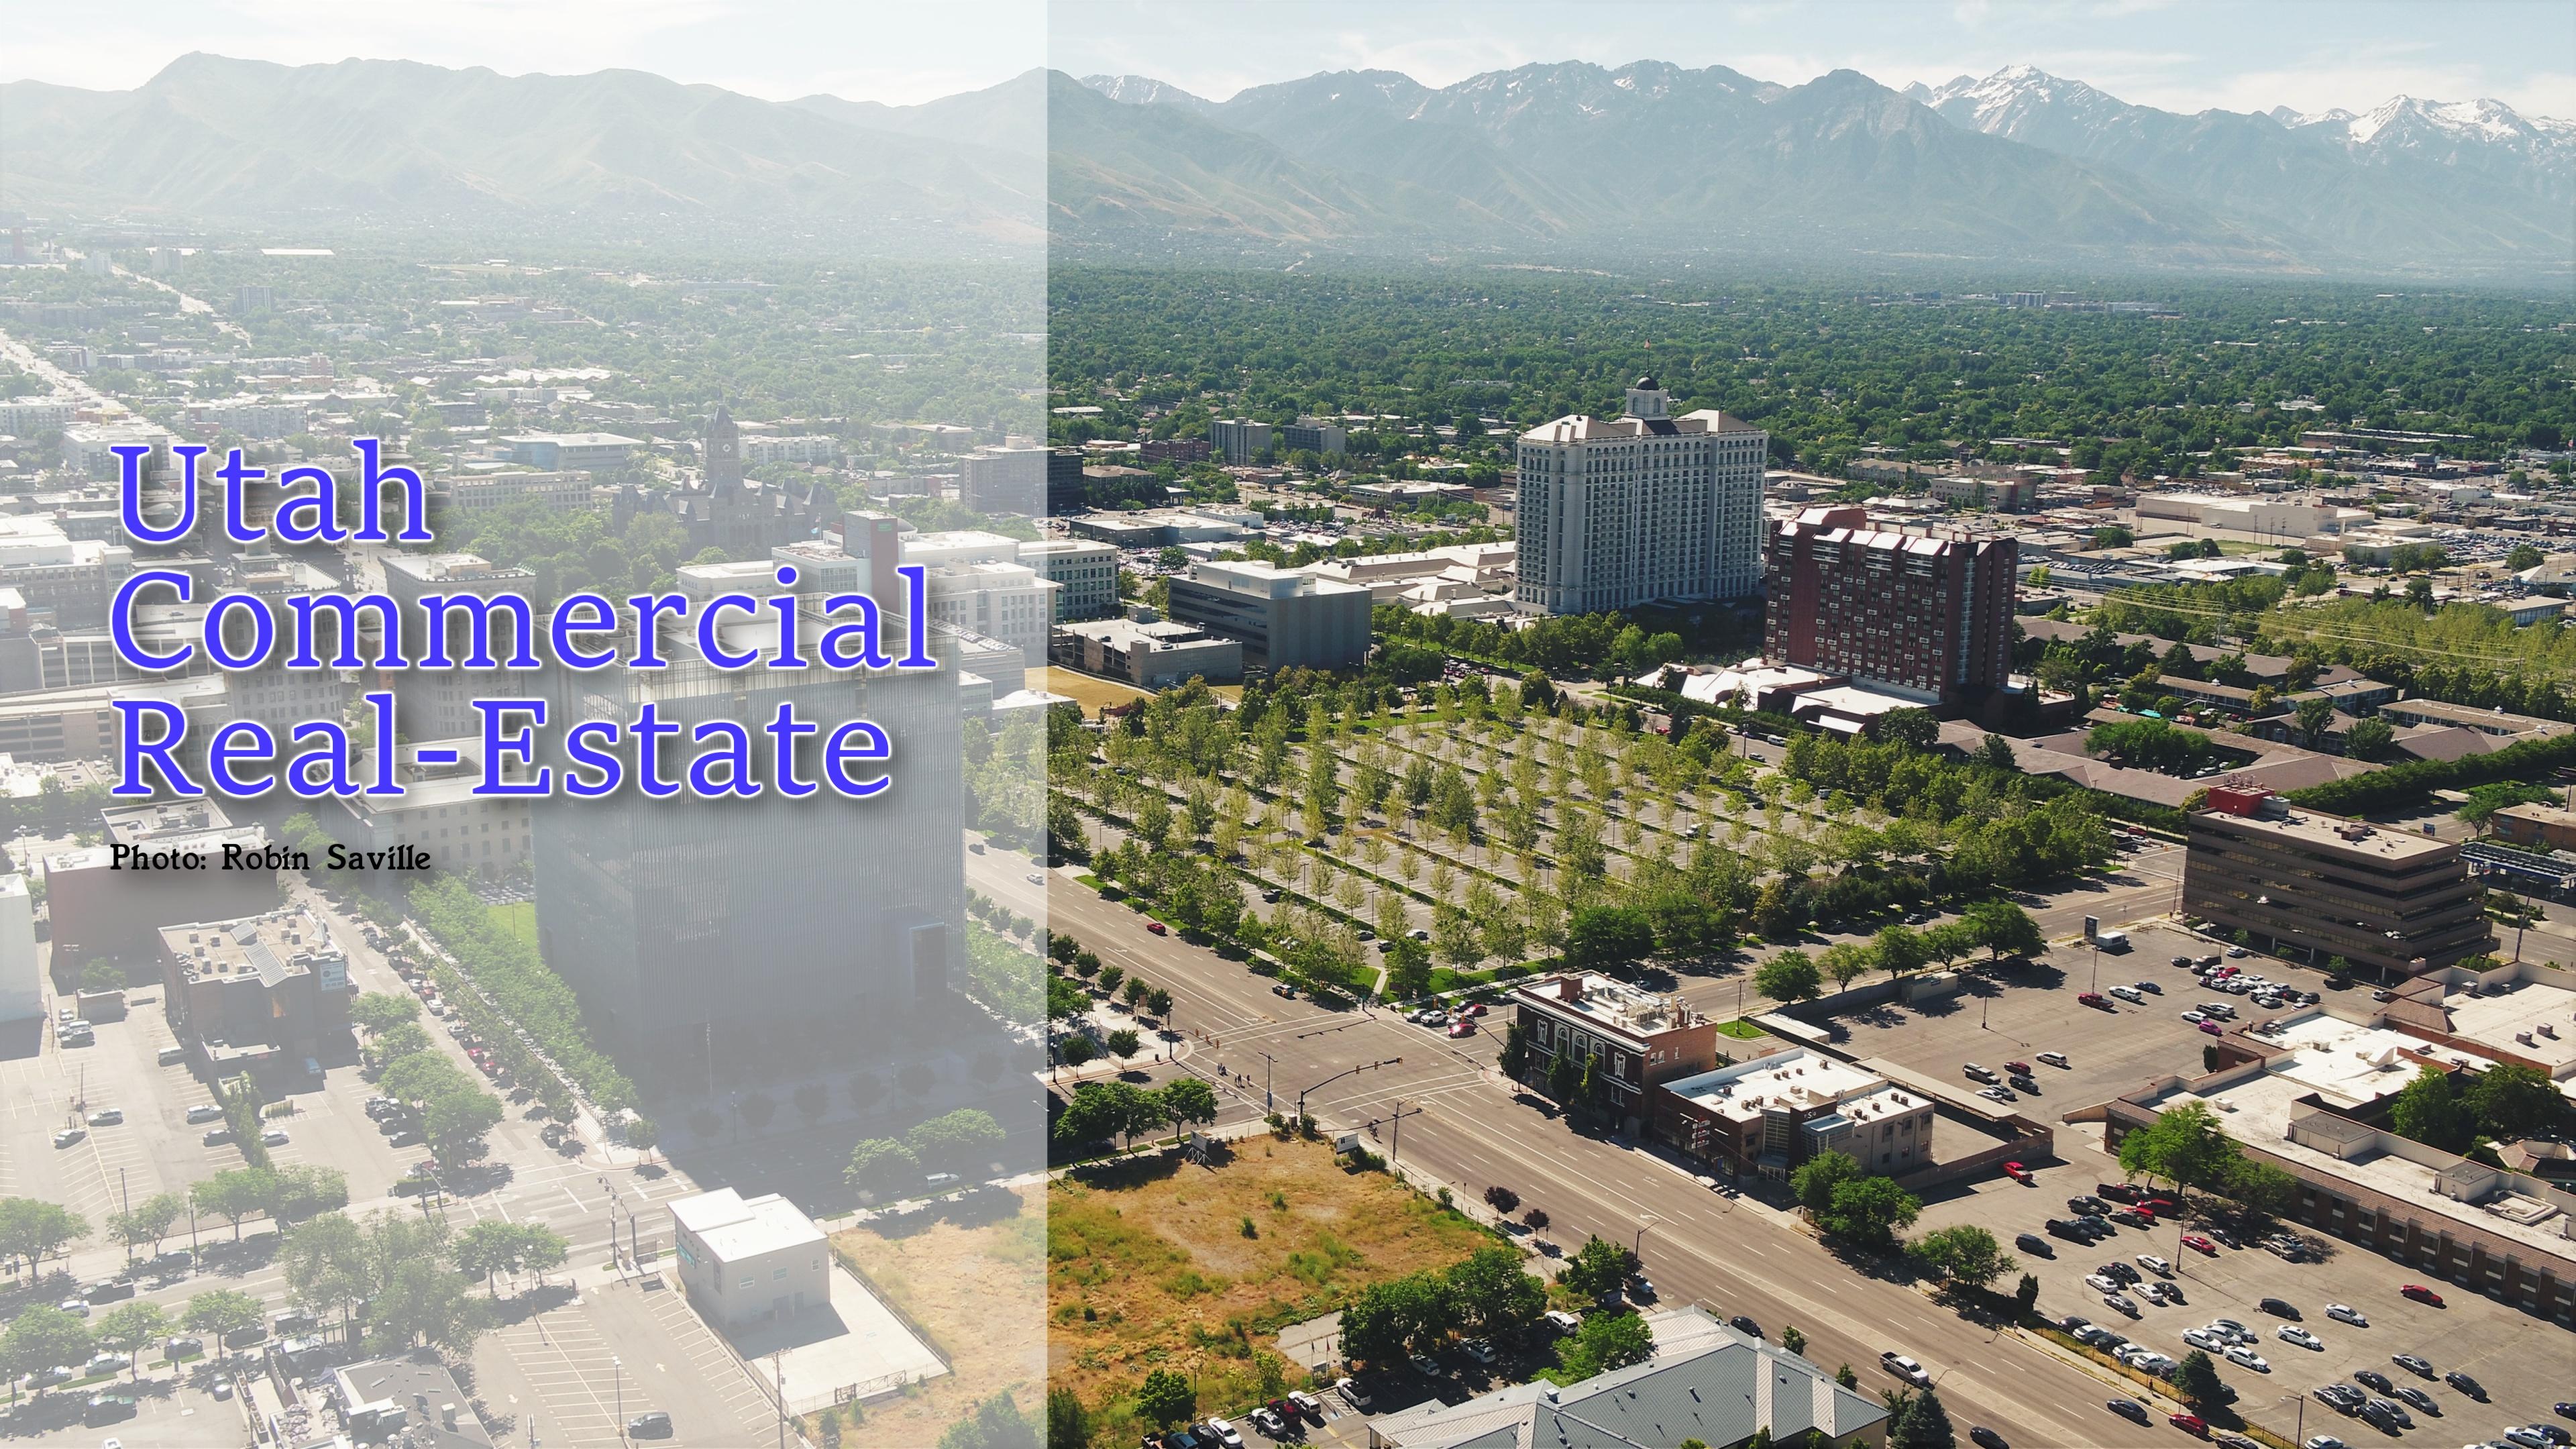 Utah Commercial Real-Estate